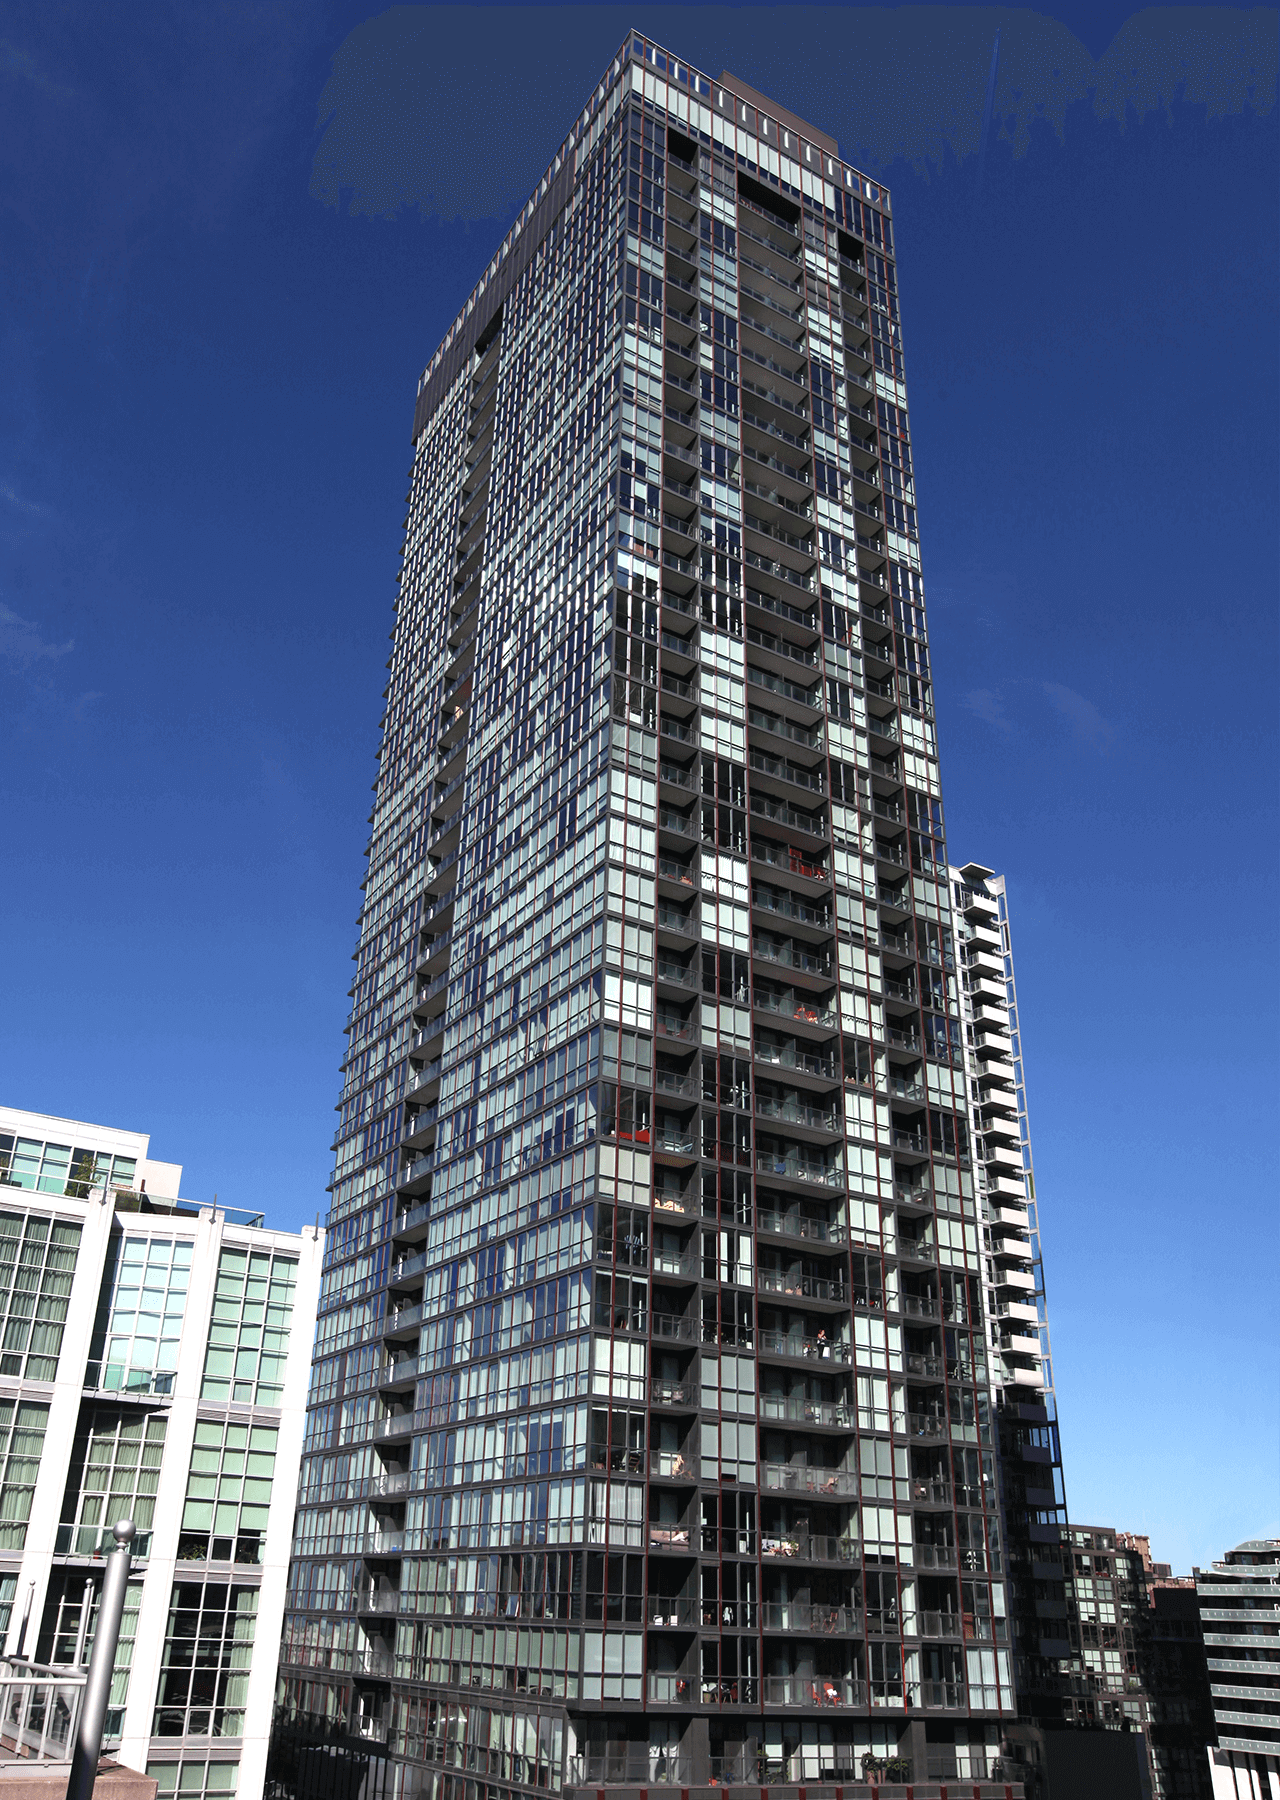 Bisha Hotel and Condominium Residence Building